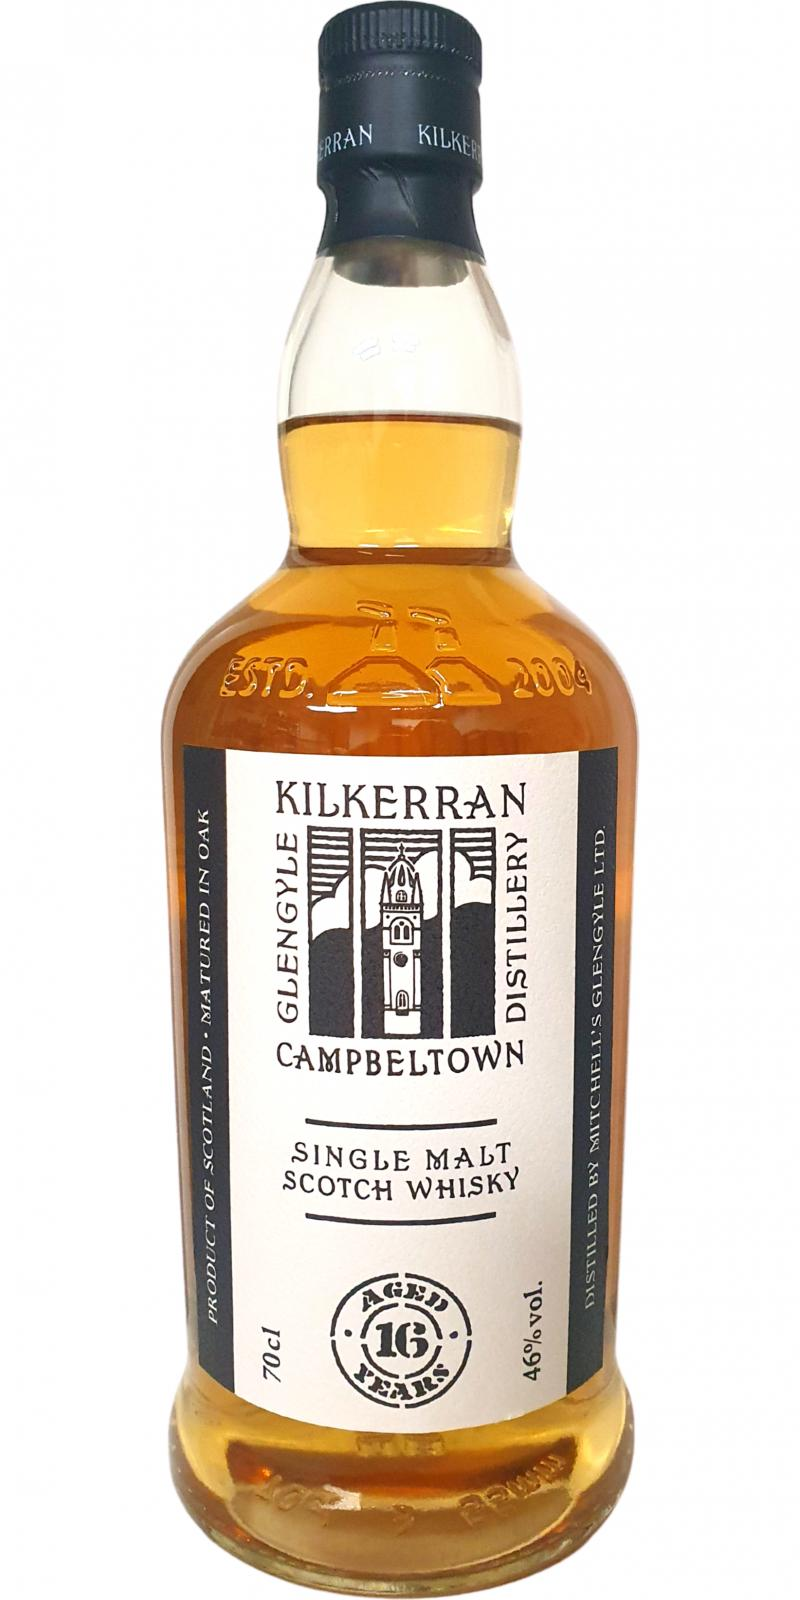 Kilkerran 16-year-old